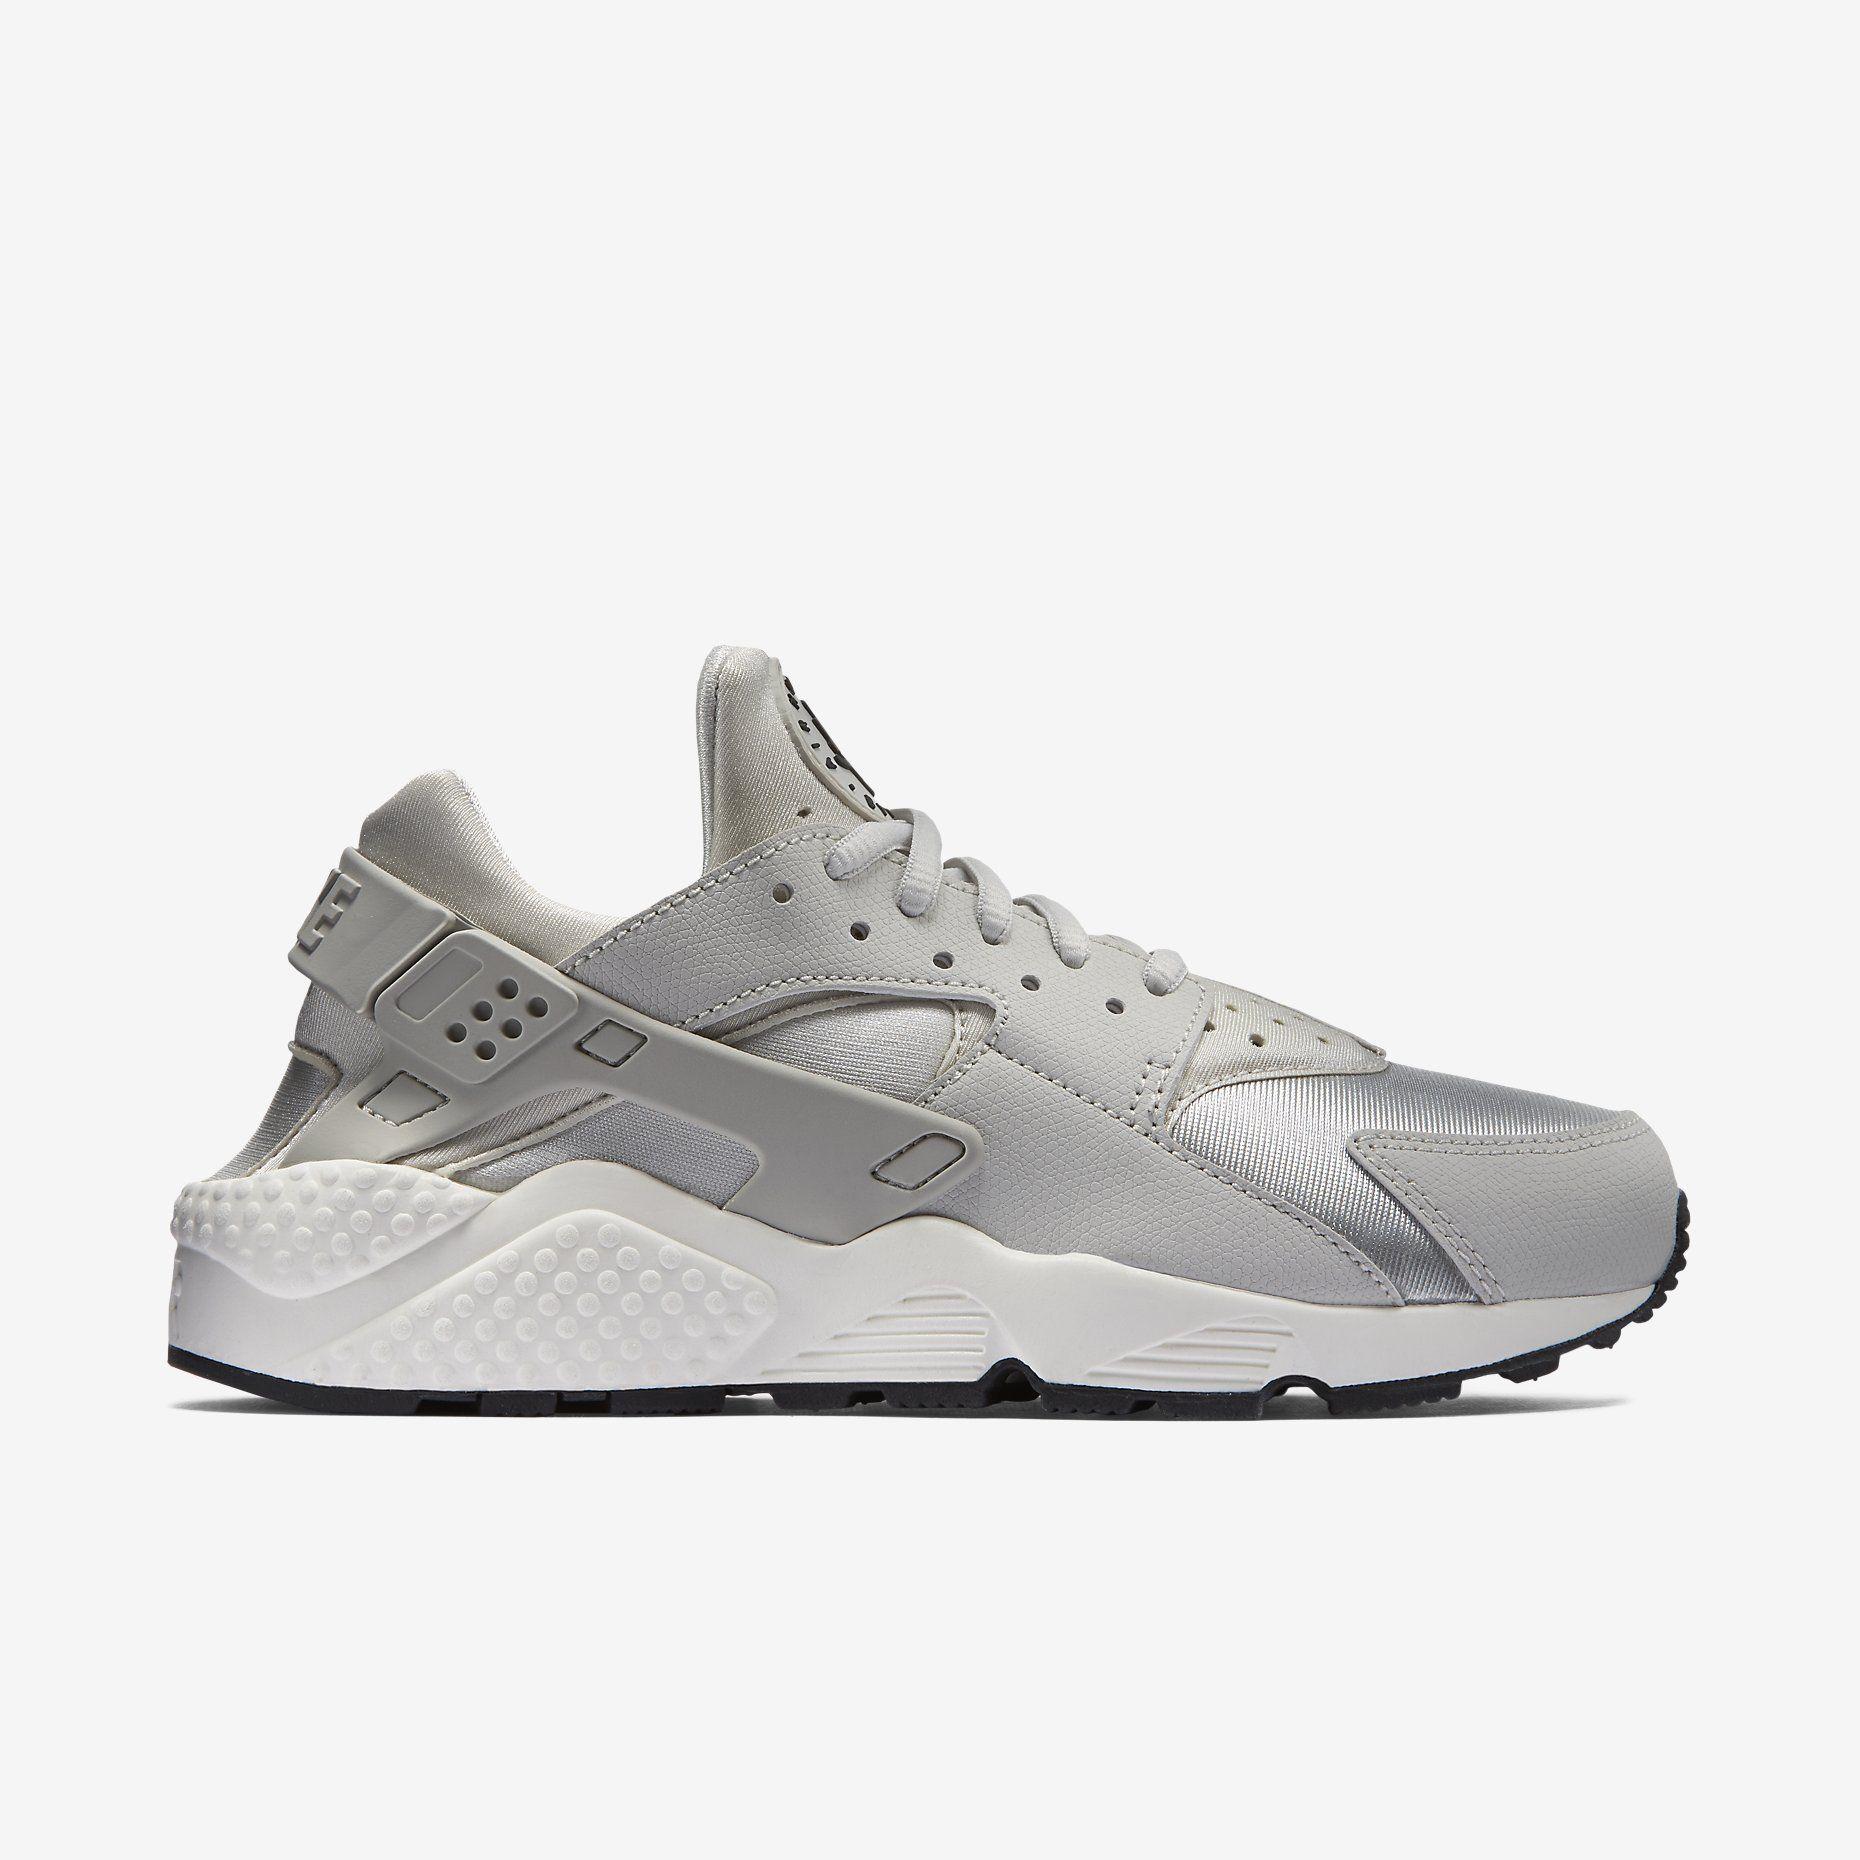 promo code 8d697 d66bb Nike Air Huarache Women s Shoe. Nike Store SE. Nike Air Huarache Women s  Shoe. Nike Store SE Pompe, Chaussures Femme ...